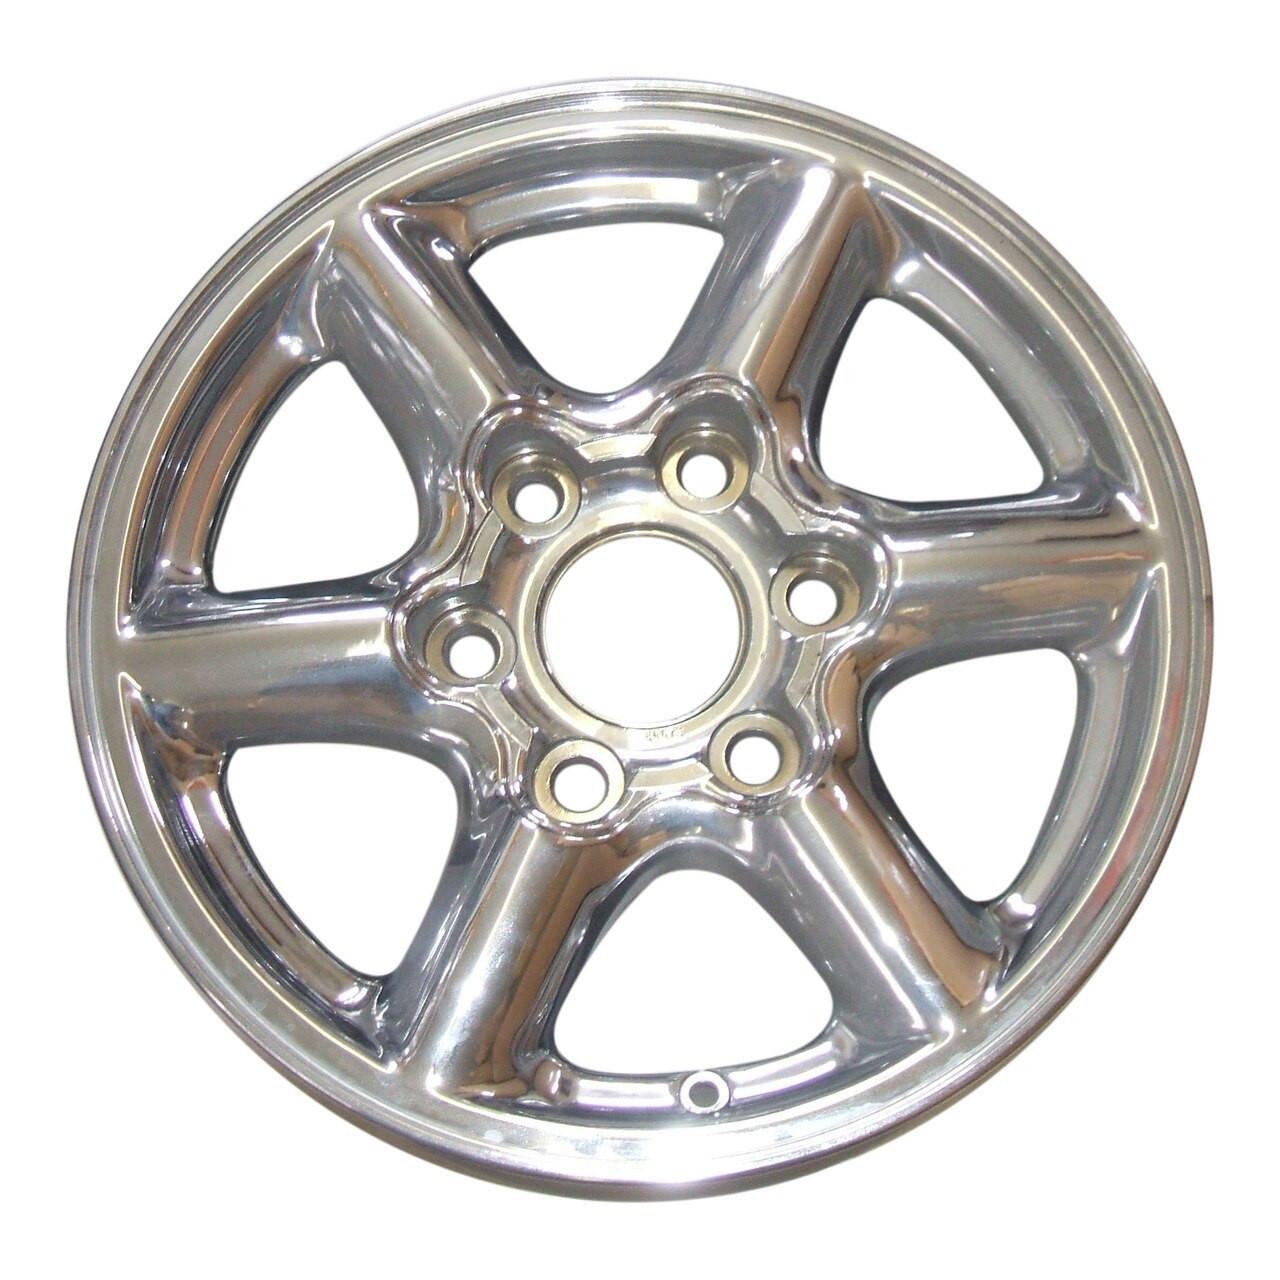 1999 2000 Gmc Denali Yukon Cadillac Escalade 16 Factory Original Chrome Wheel Rim 5094 5068